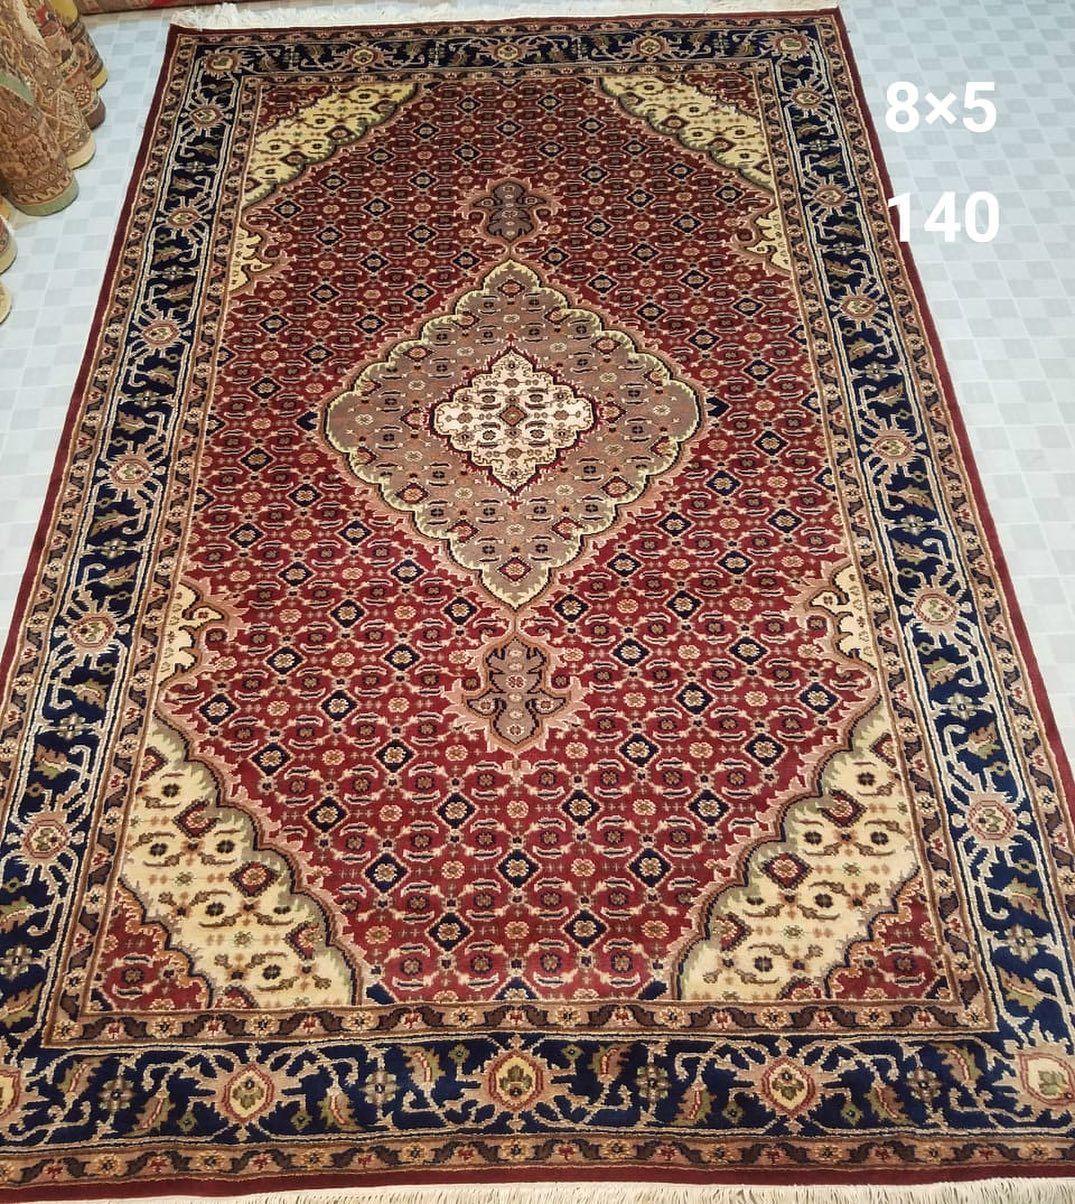 Pakistani Hand Made Carpet Silk Touch Design Mahi Tabraiz Single Knotes Size 8 5 Dm For Price Details Pakistan Karachi Ca Viscose Rug Rugs On Carpet Rugs